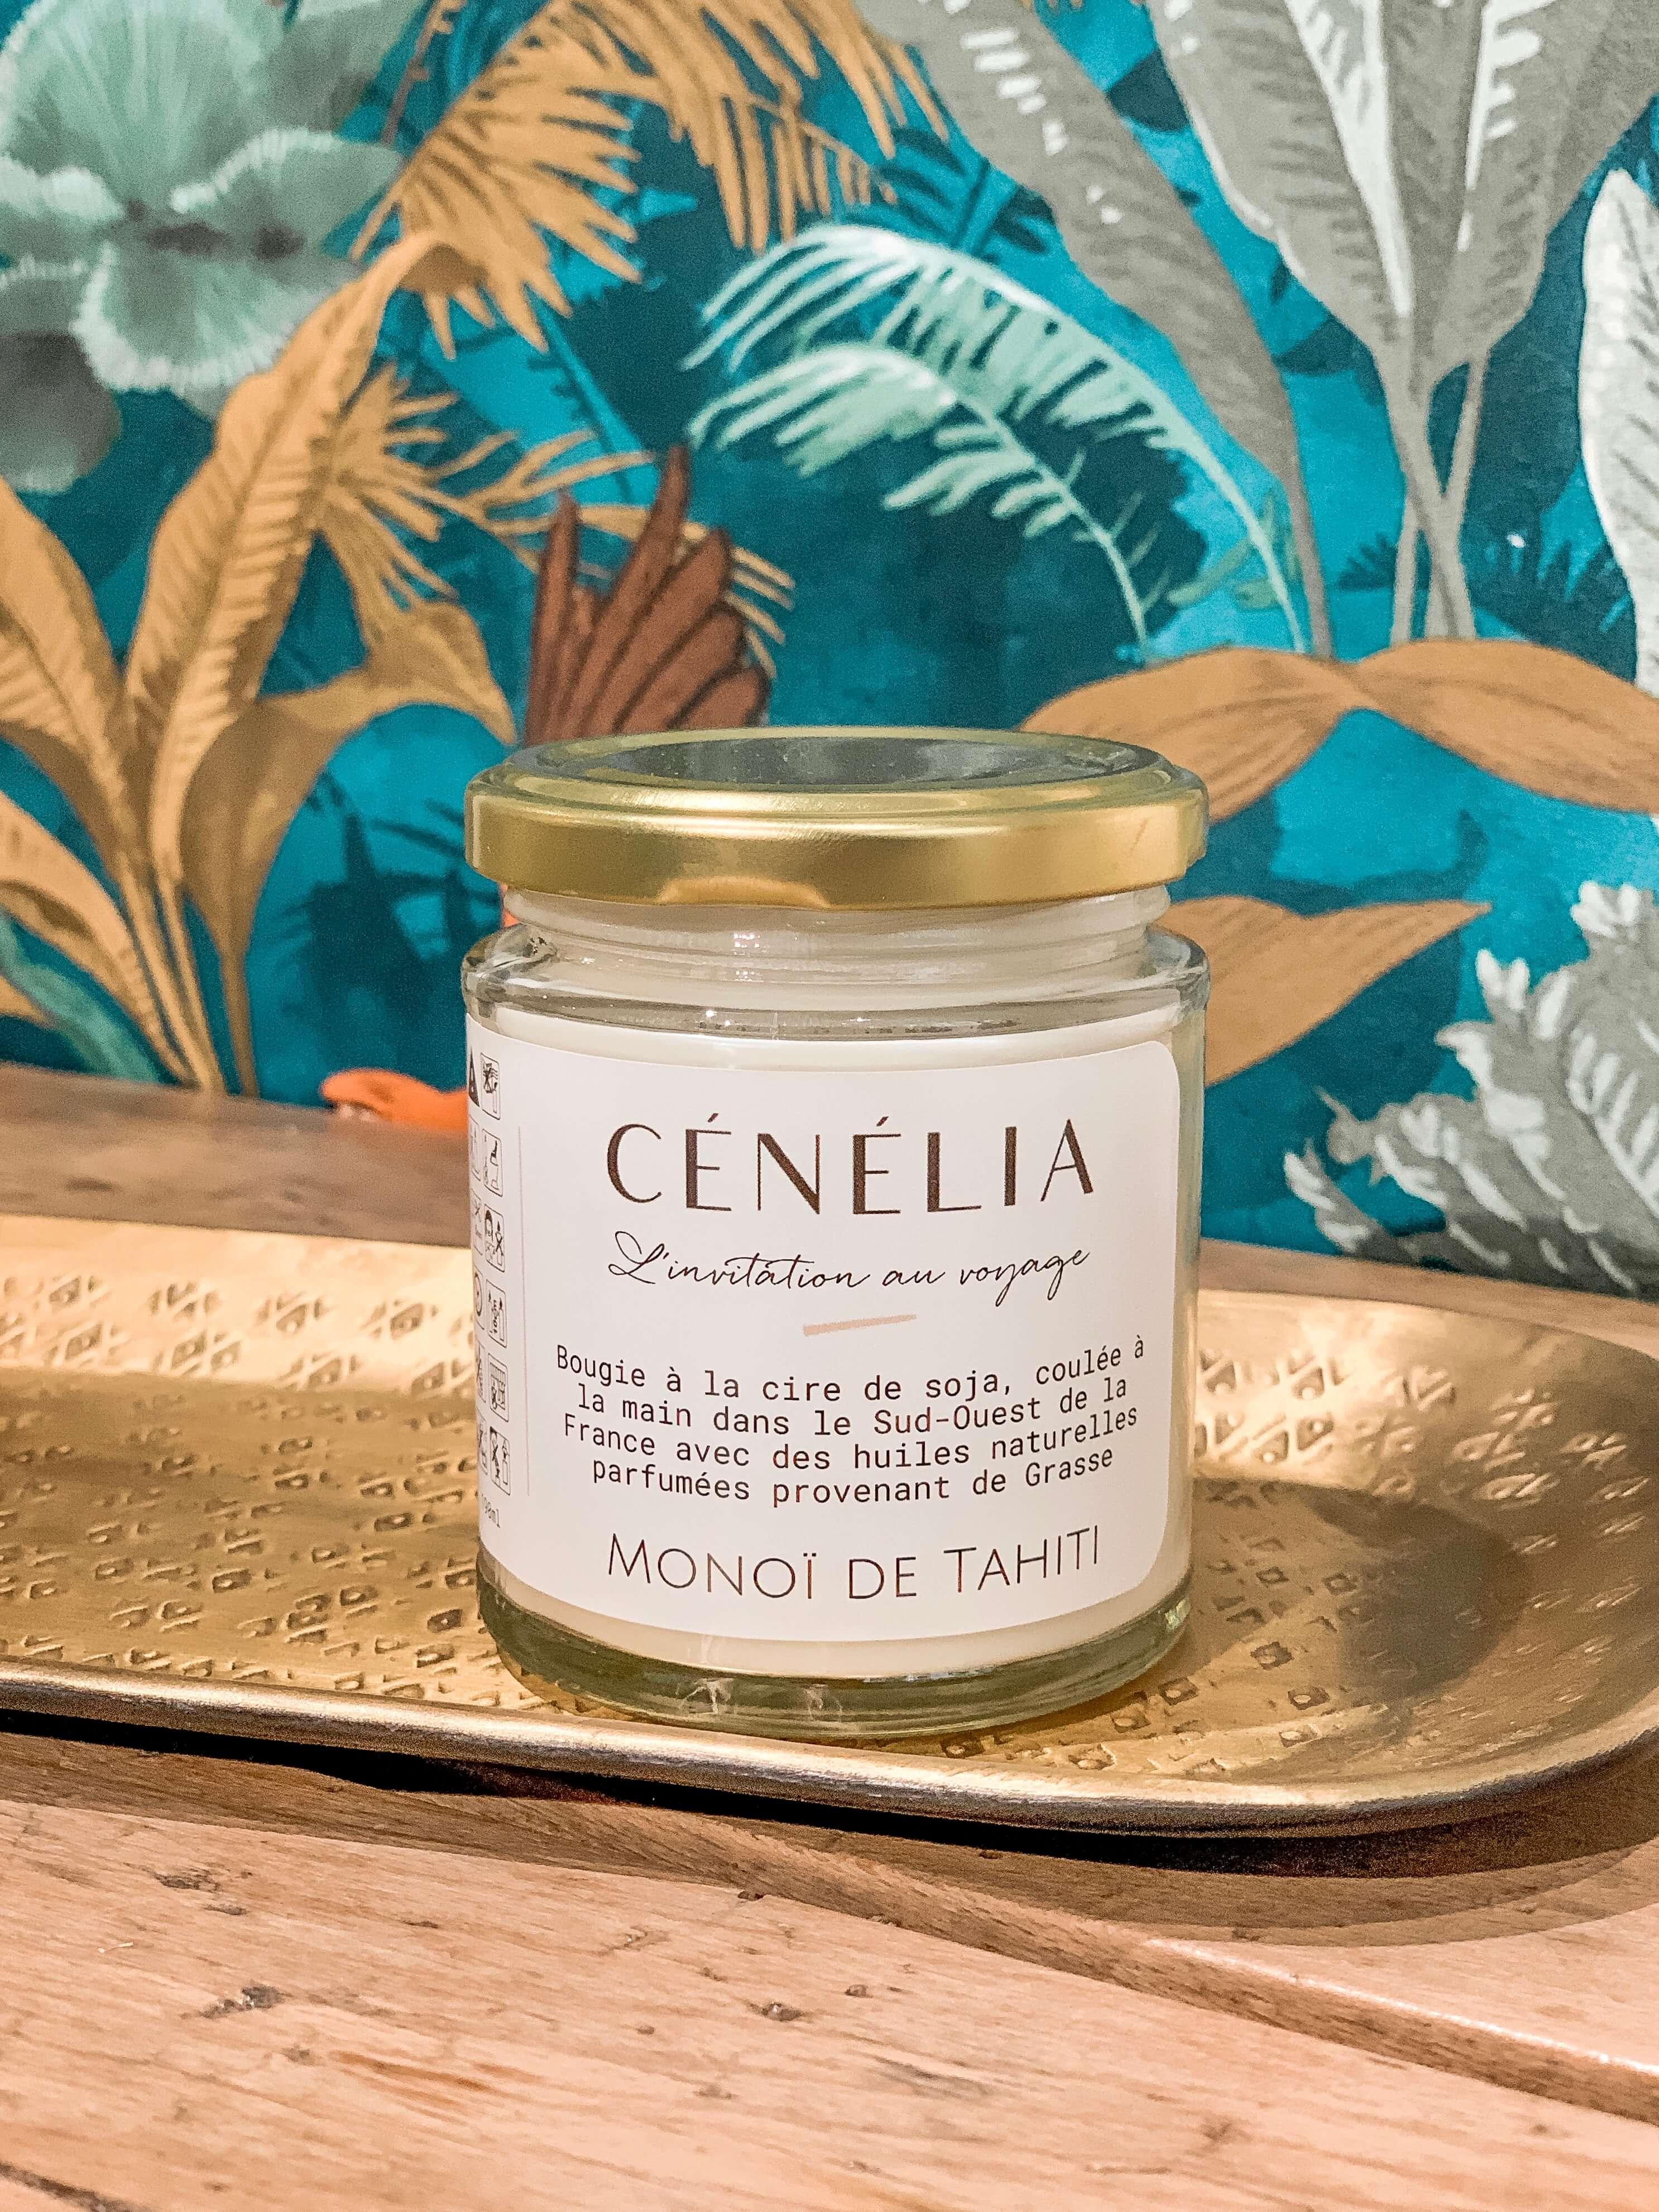 Bougie vegan - Bougie naturelle bio Cénélia - Monoï de Tahiti